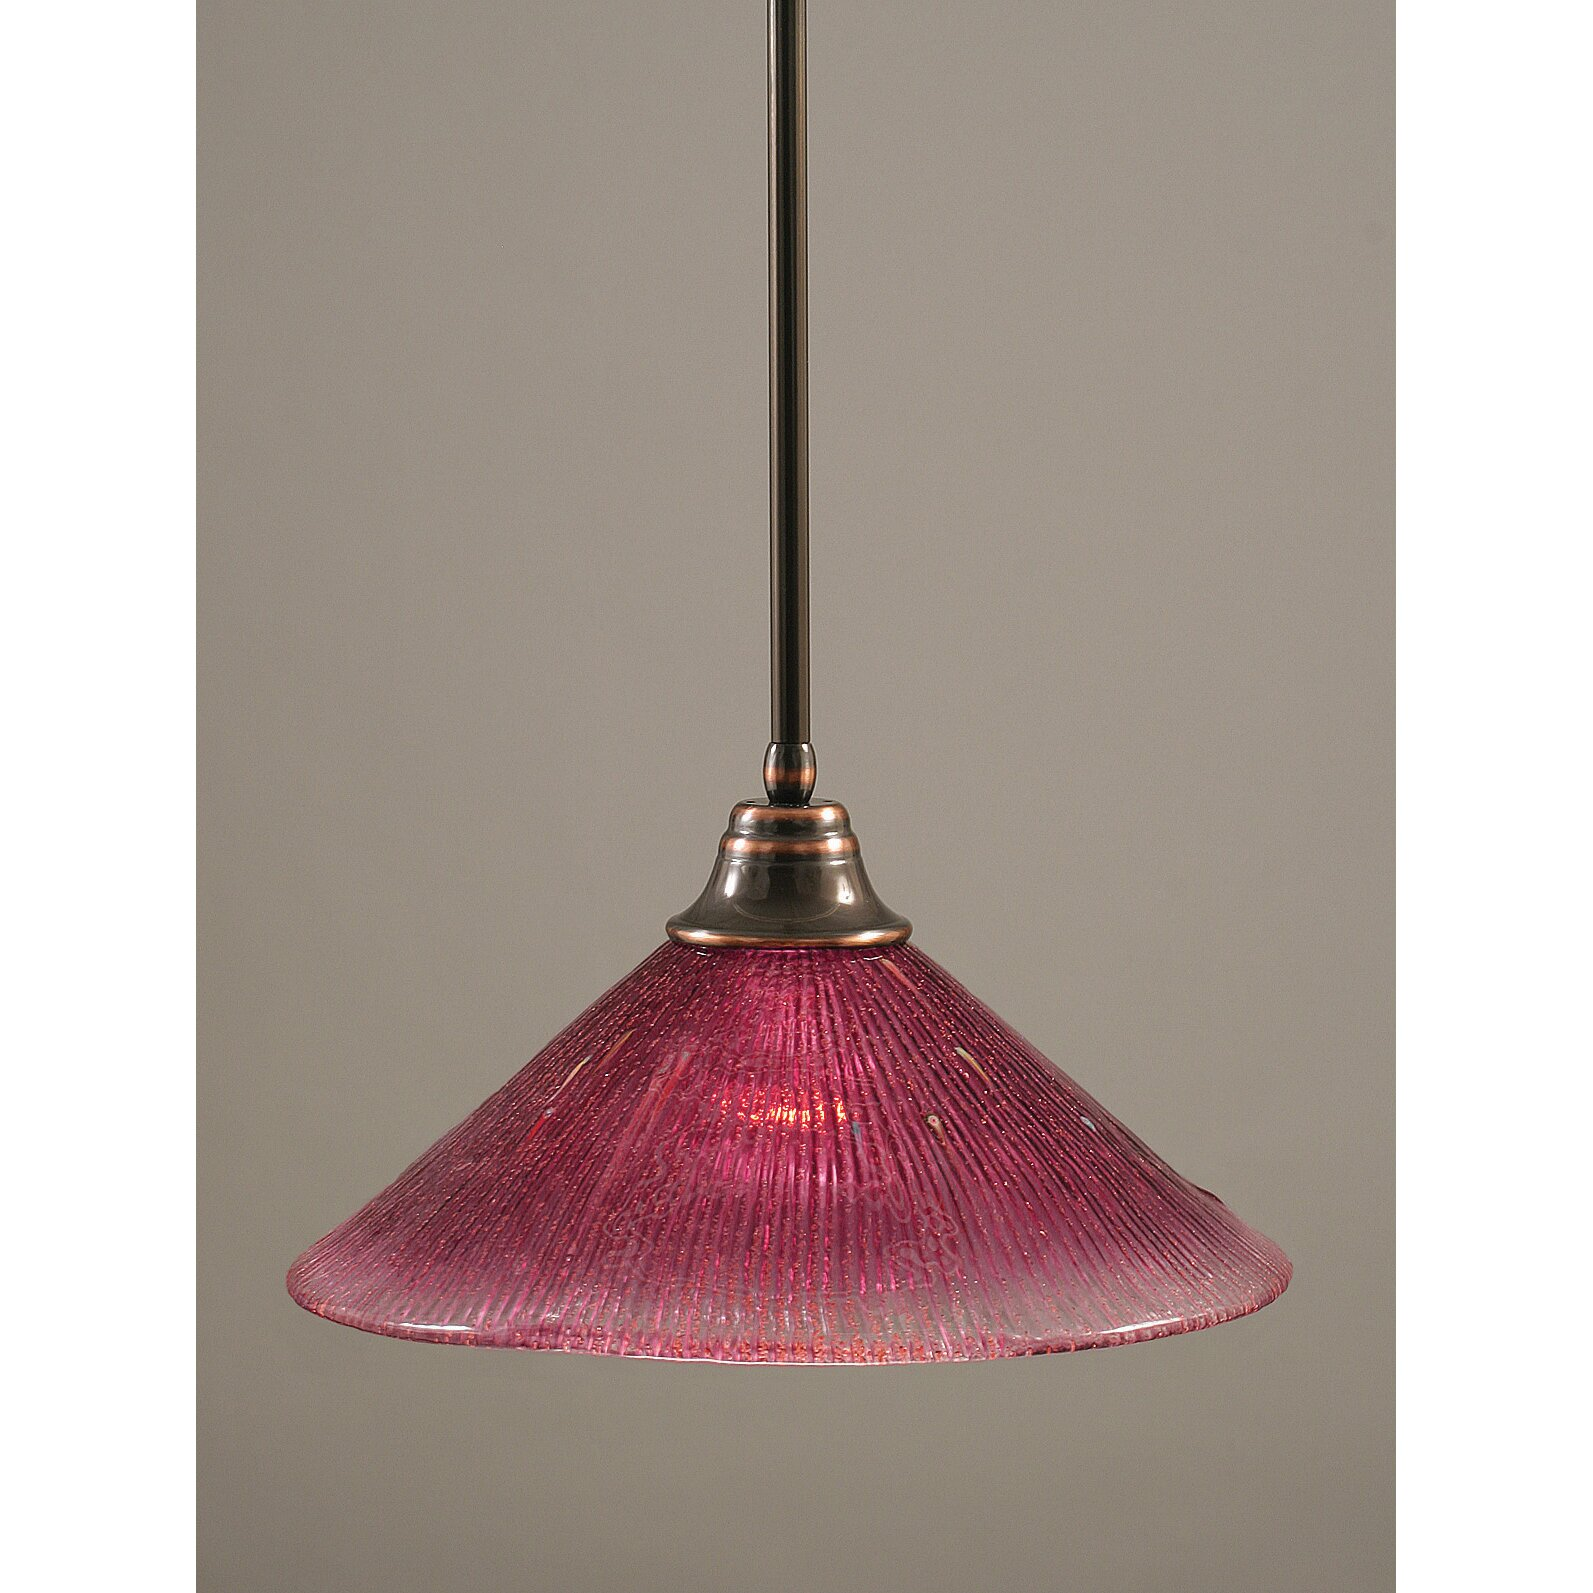 Toltec Lighting Stem Pendant With Hang Straight Swivel